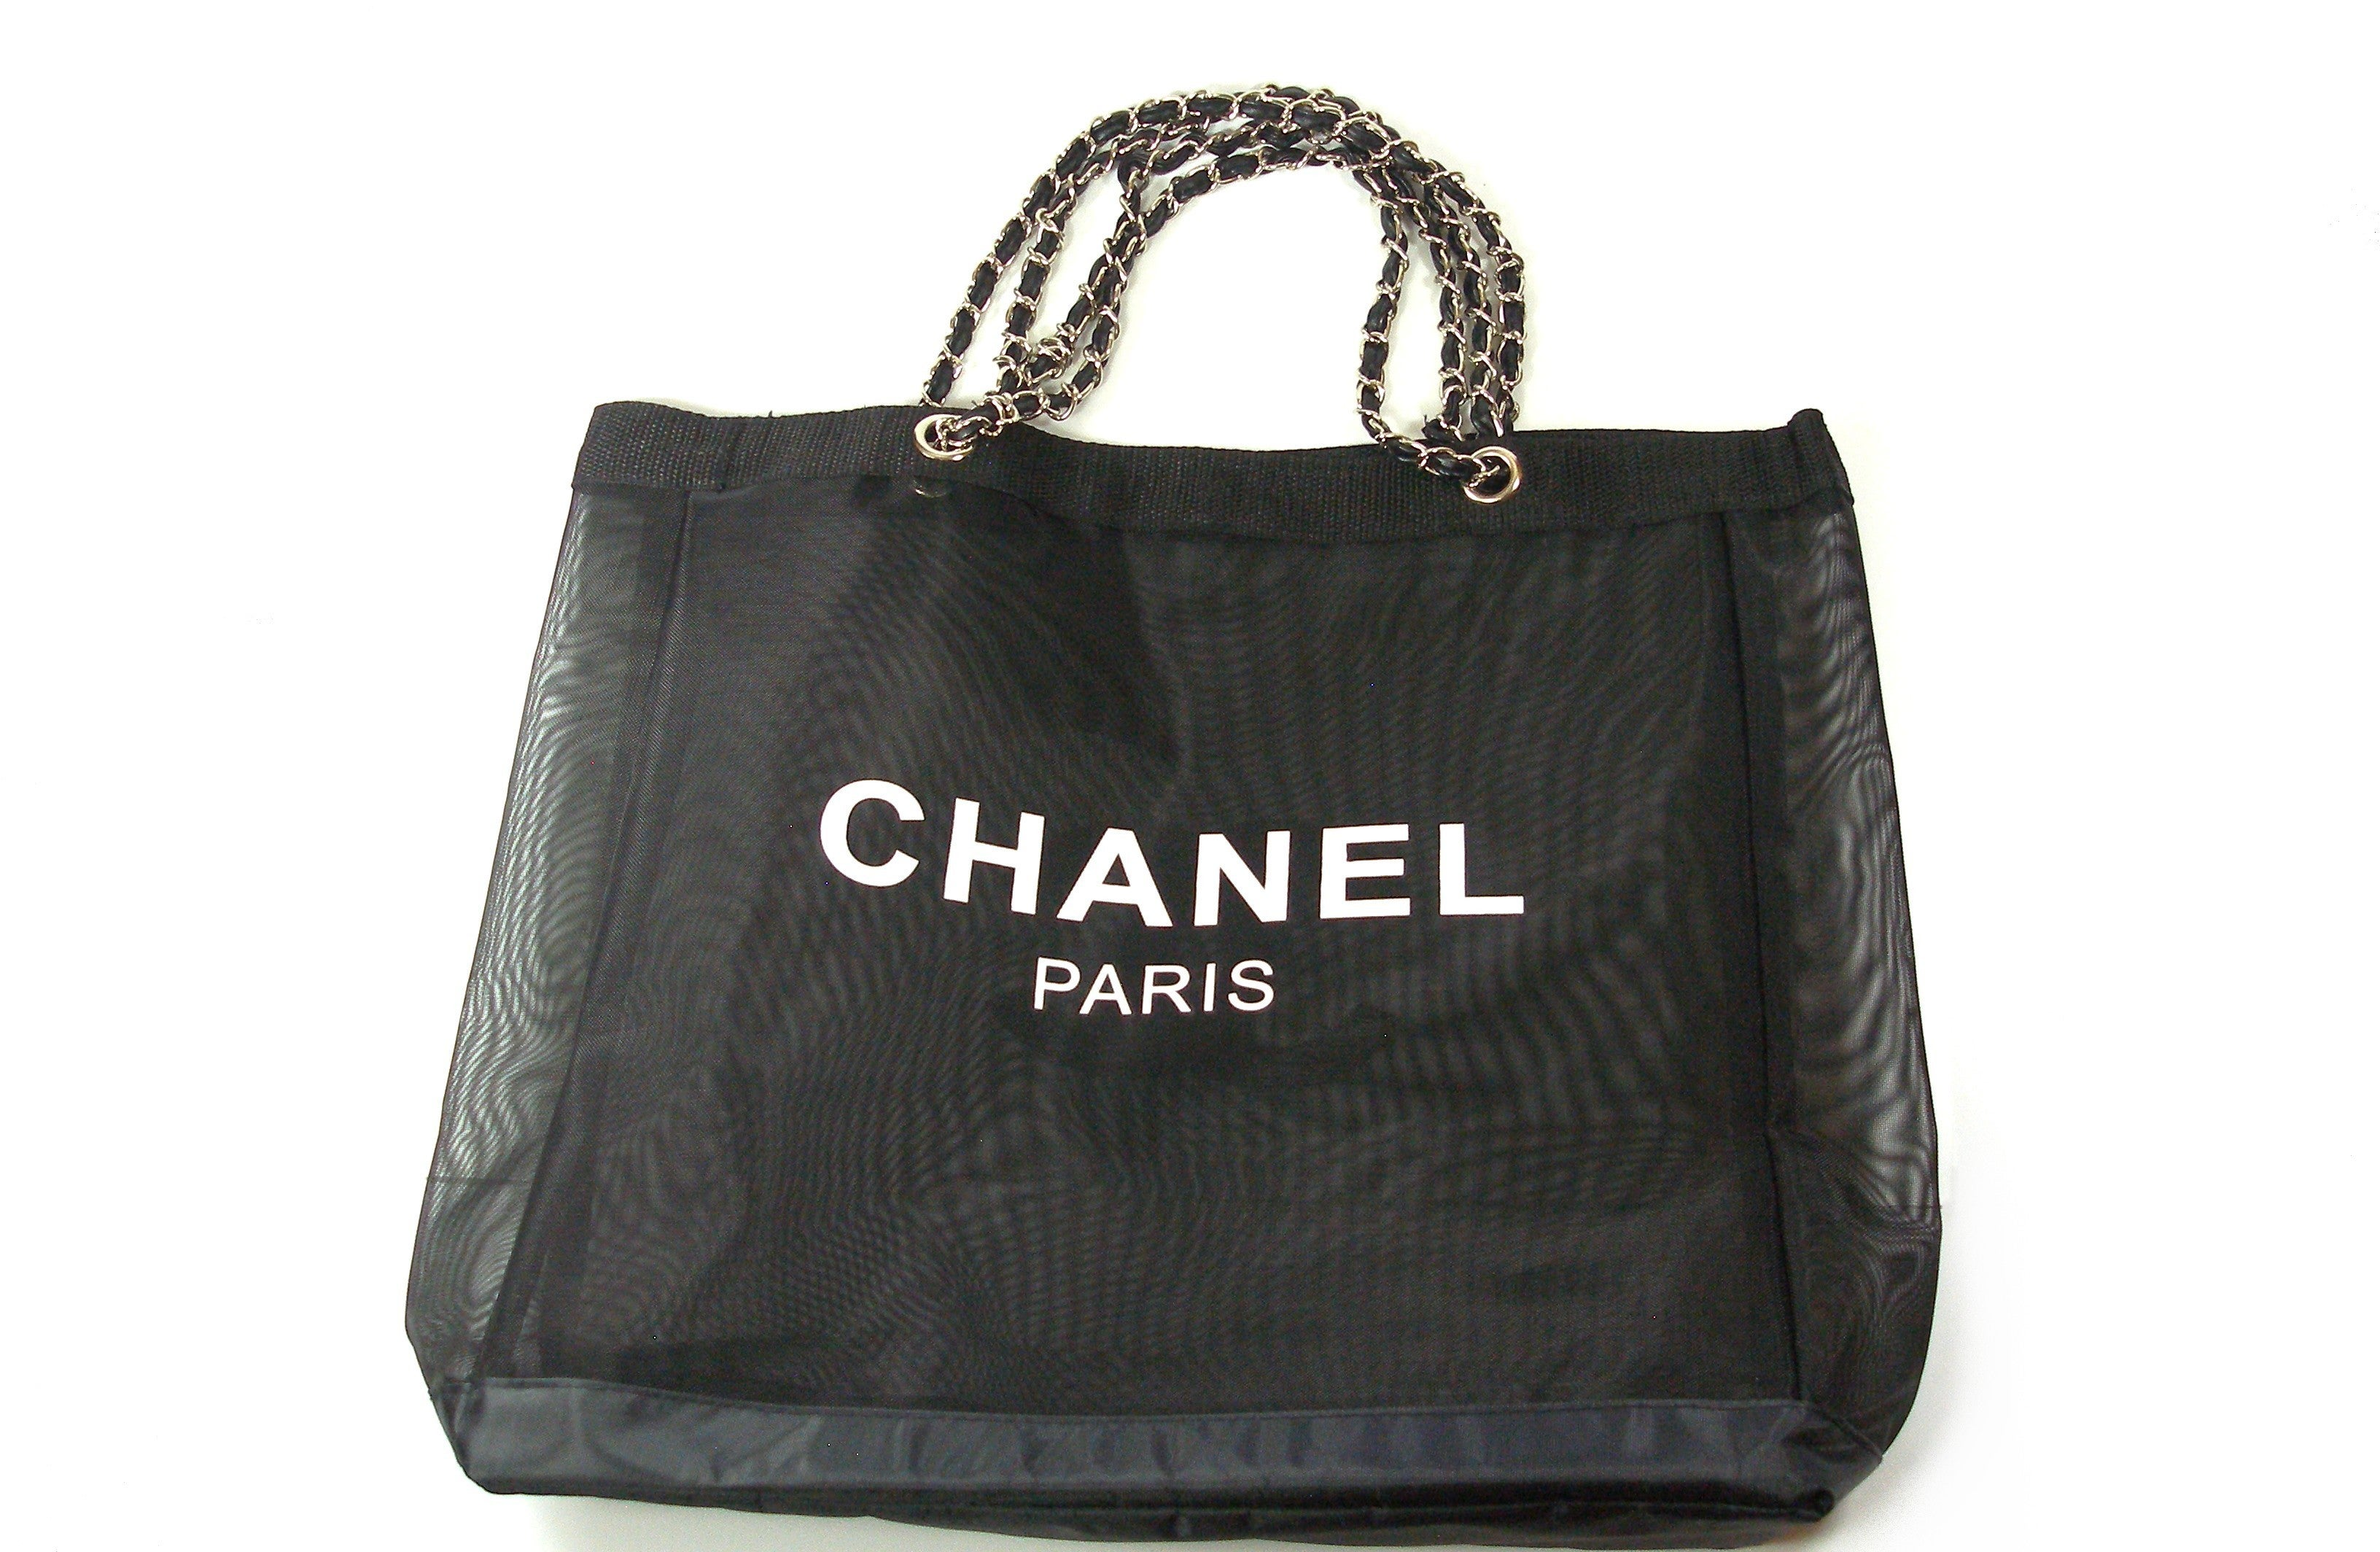 617166db07bdc5 CHANEL VIP Black Mesh Tote Bag Shopping Travel SHOPPER / BRAND NEW at  1stdibs